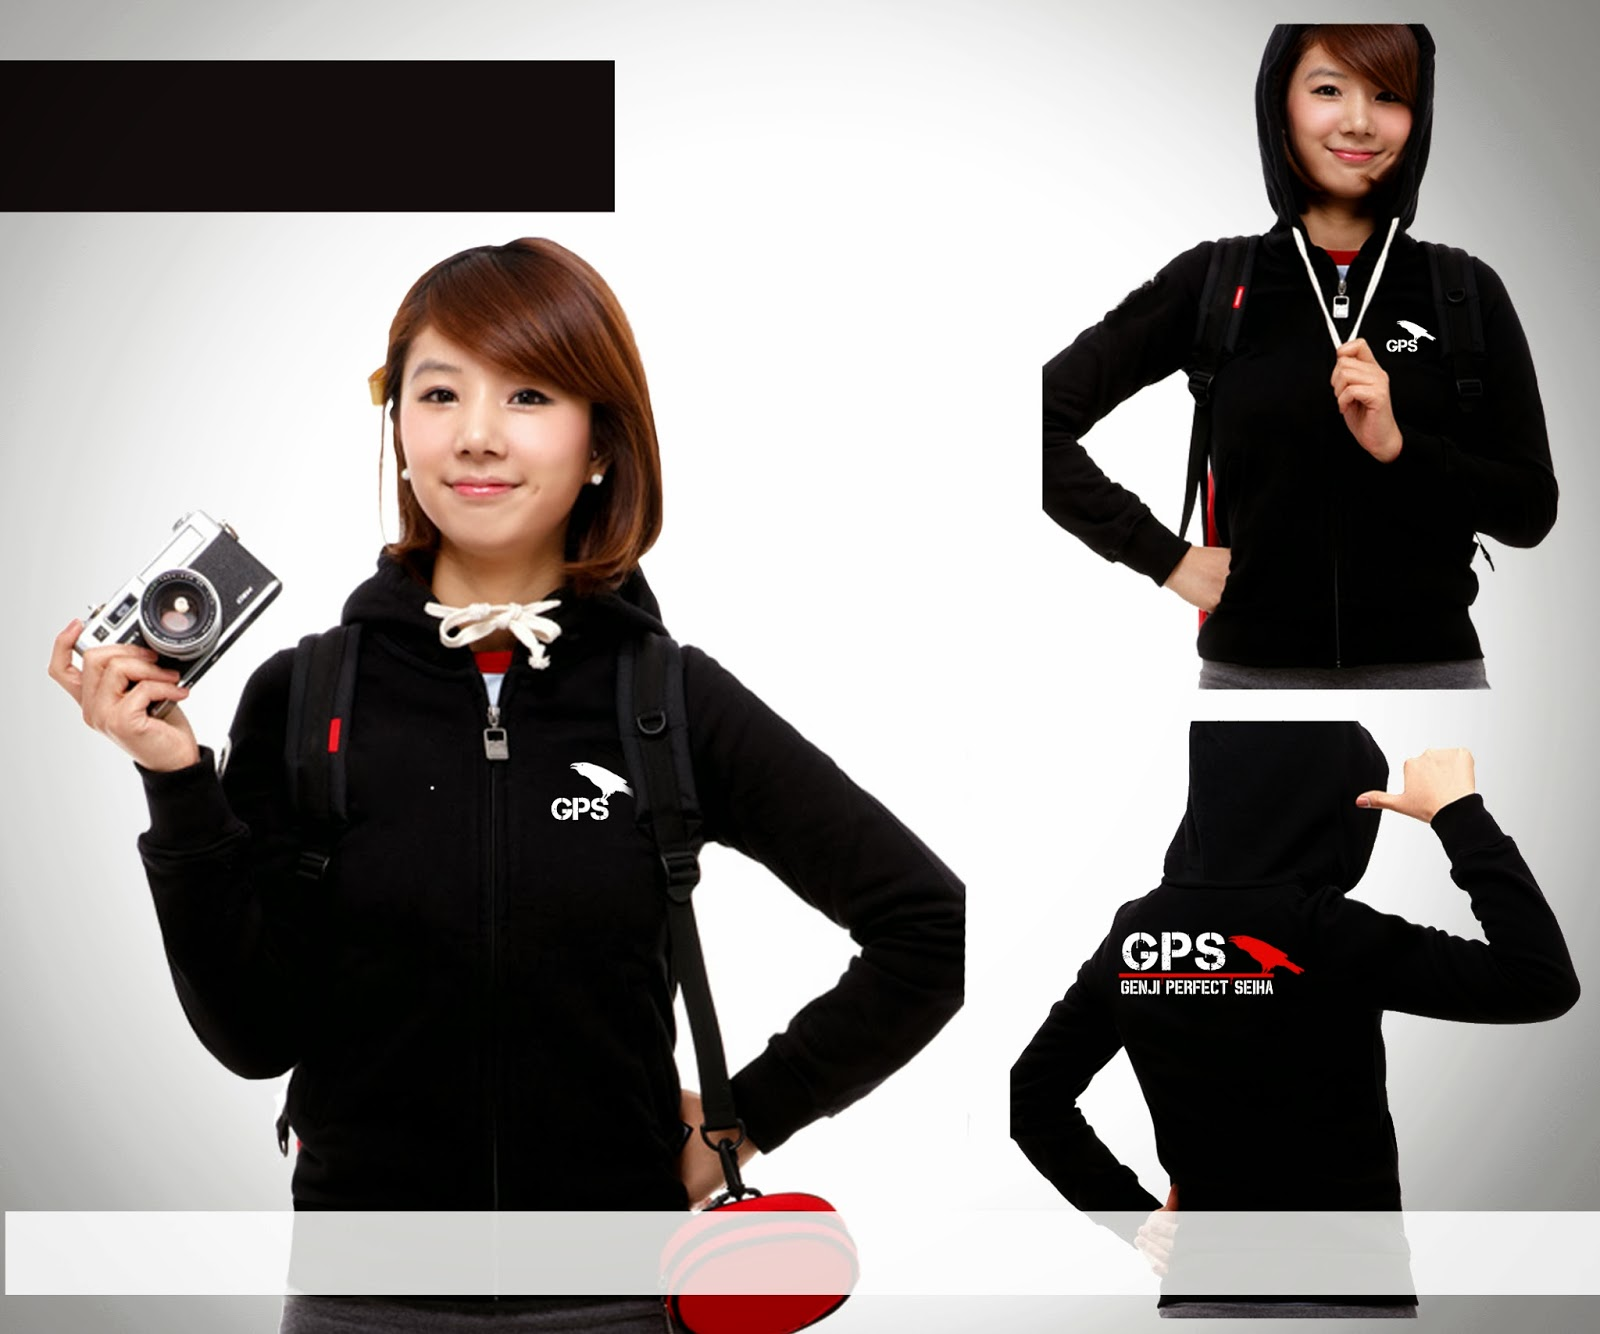 http://limitedshoping.com/jaketcrowszero_genji-perfect-seiha_s-4